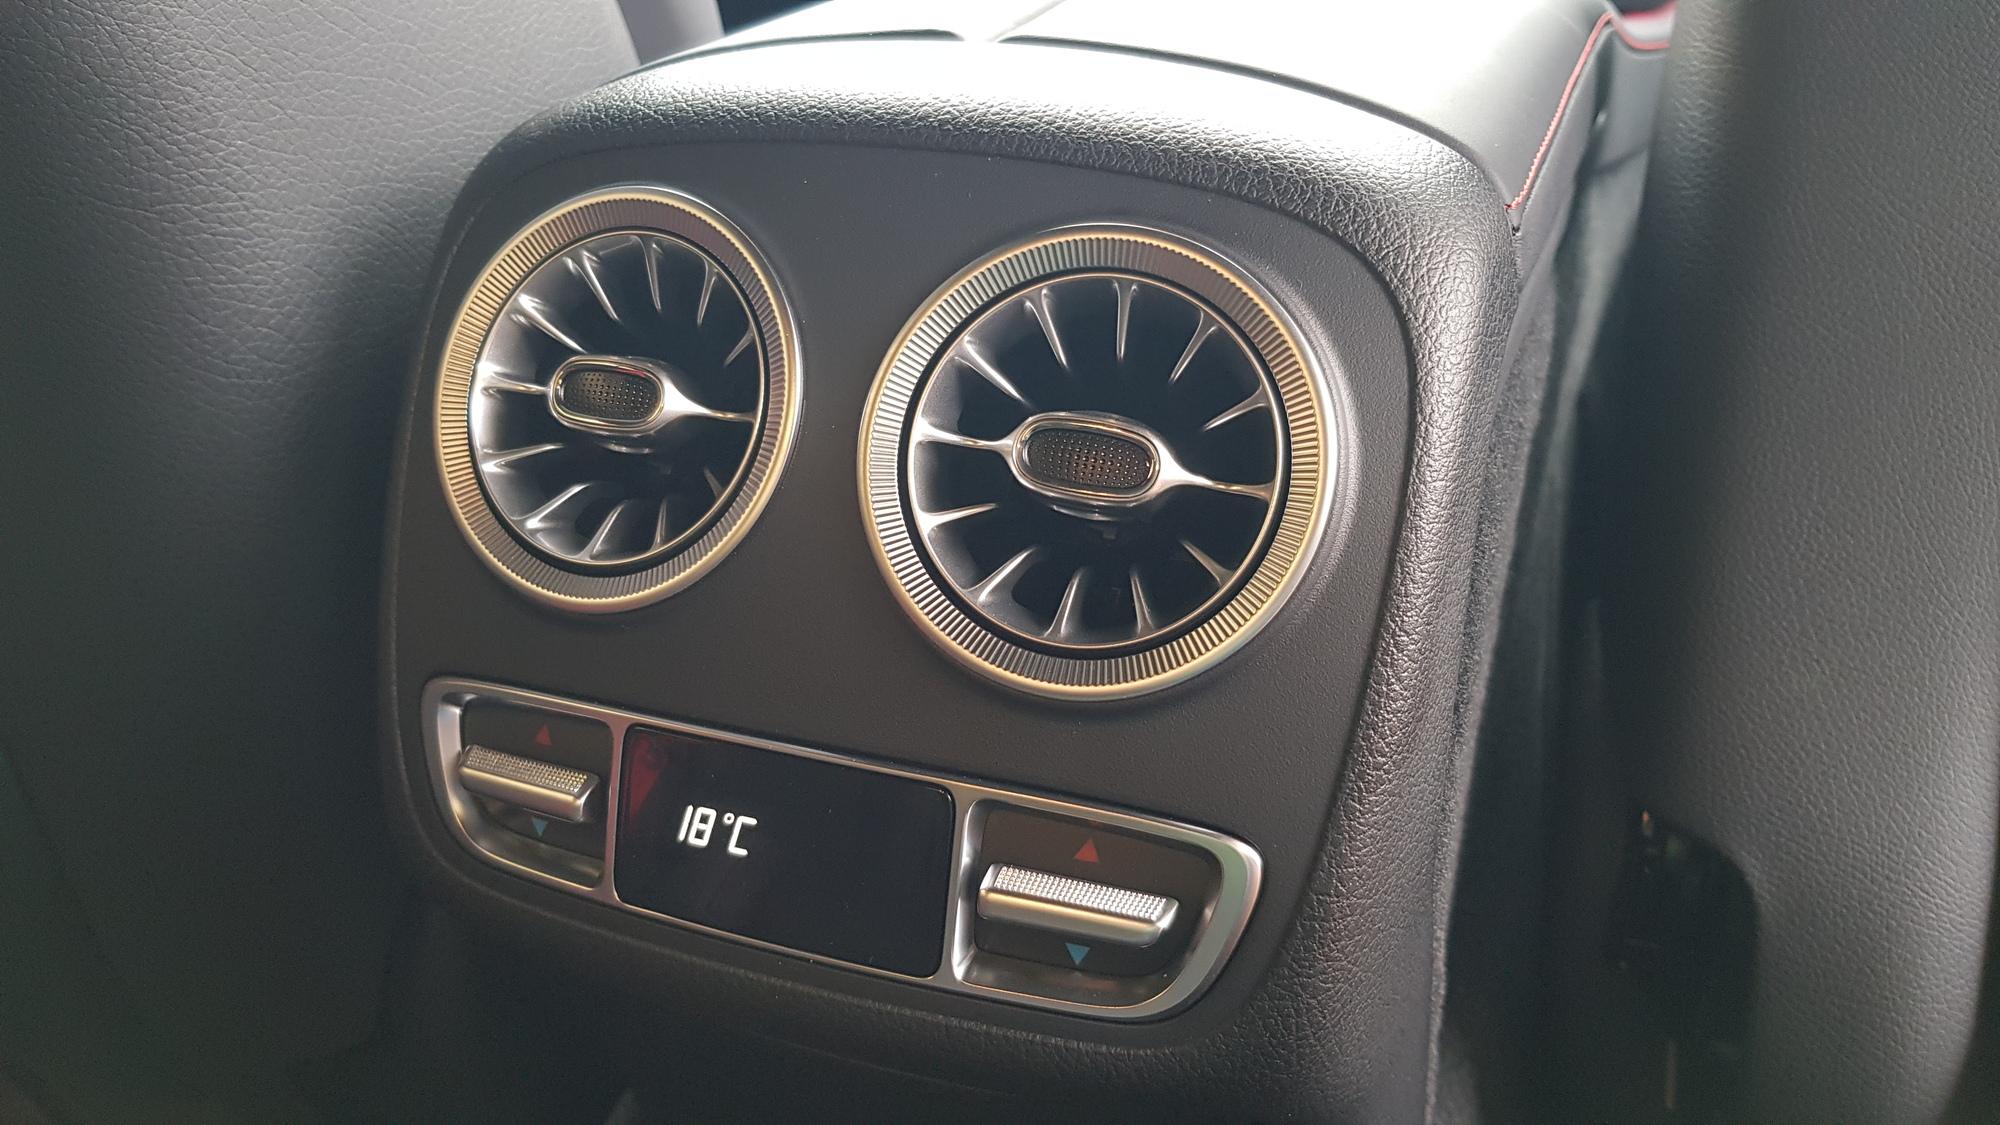 مرسيدس AMG E 53 4MATIC + كوبيه لعام 2021